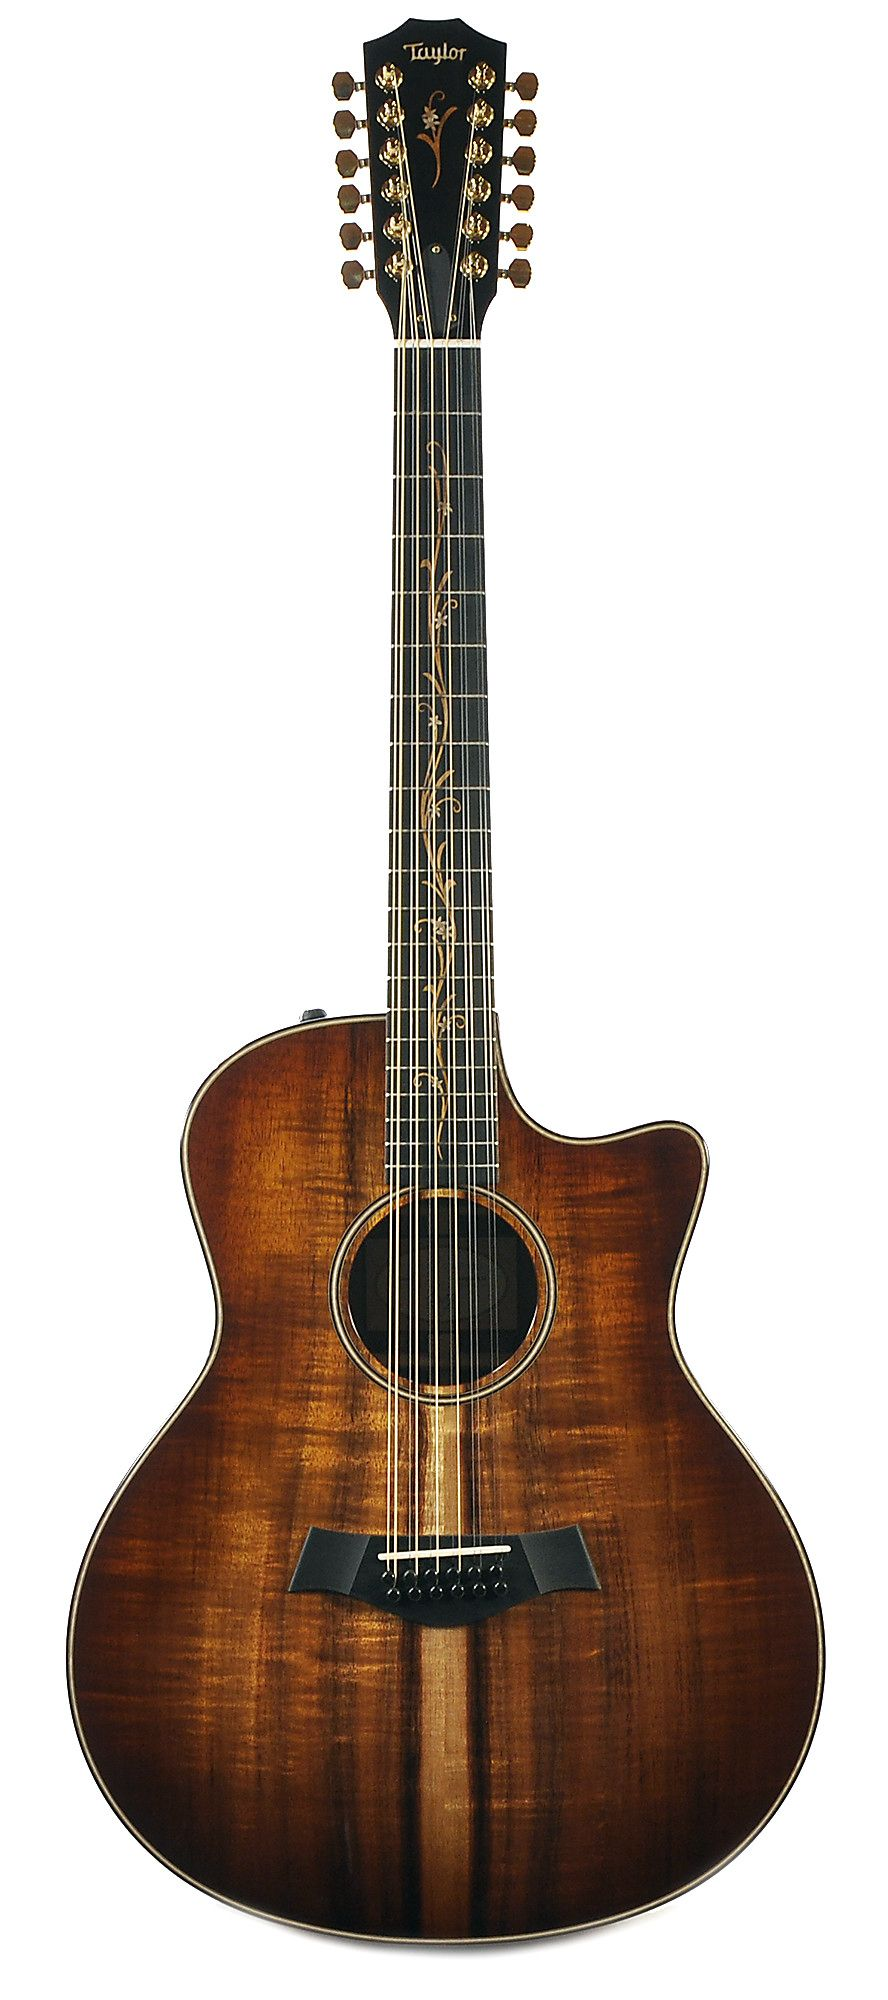 taylor k66ce 12 string grand symphony hawaiian koa chicago music exchange guitars in 2019. Black Bedroom Furniture Sets. Home Design Ideas